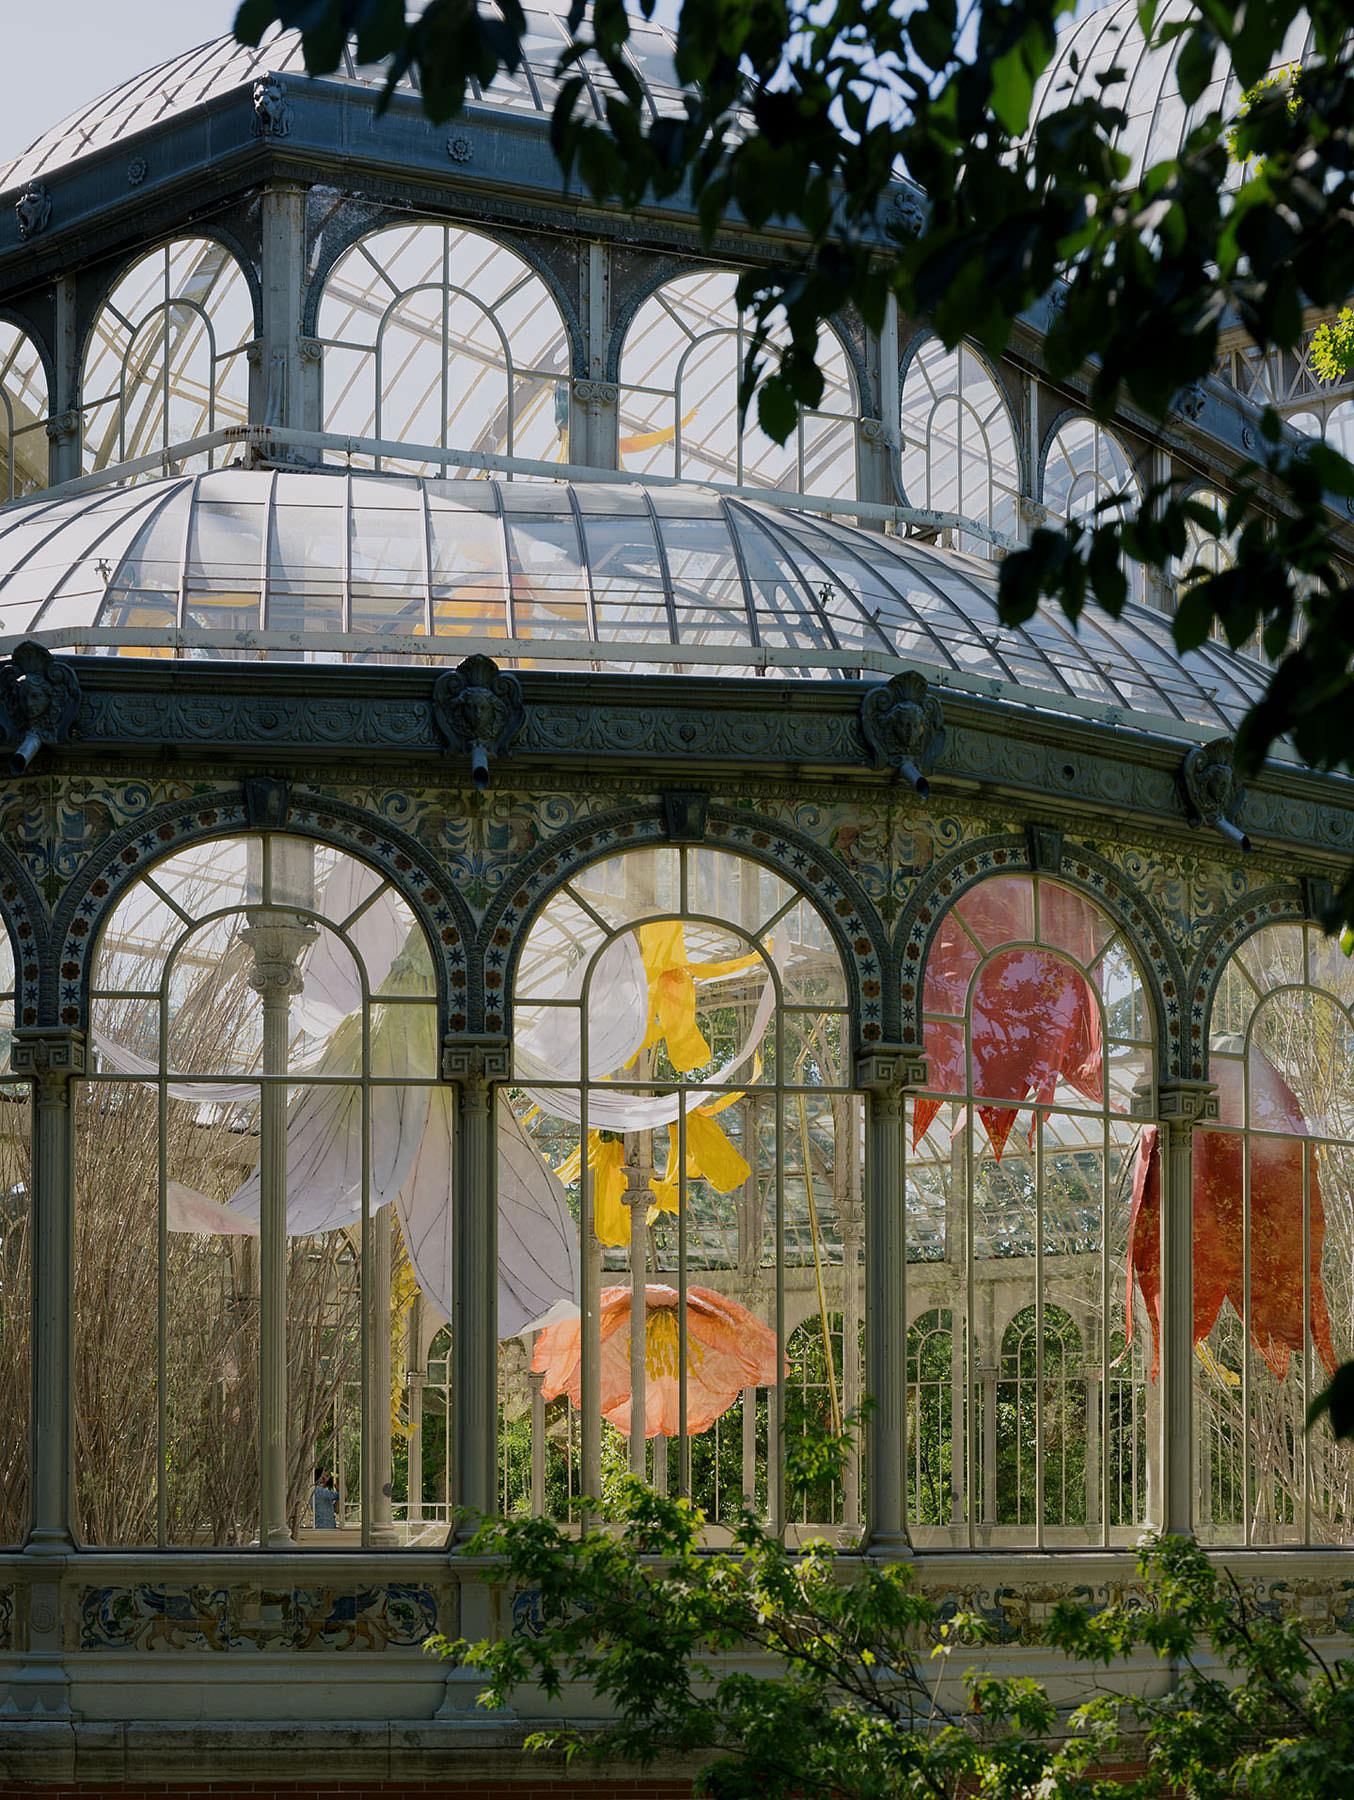 Petrit Halilaj at Reina Sofia Madrid, Palacio De Cristal, Installation Art | Yellowtrace